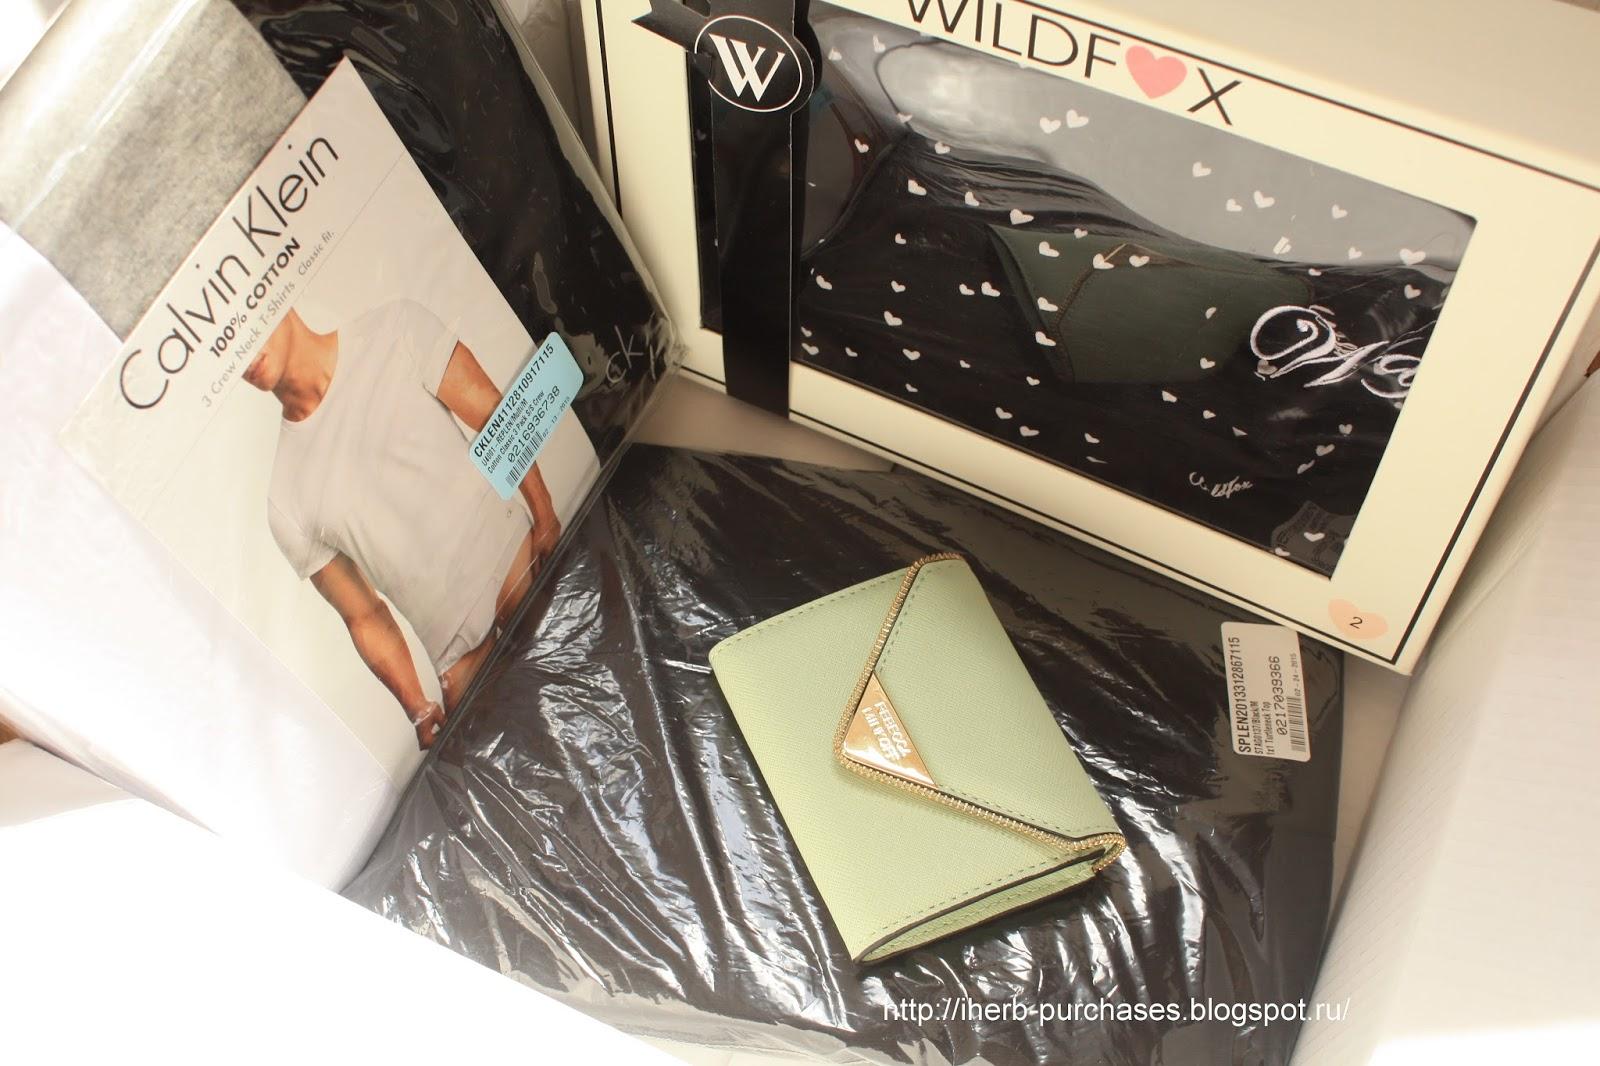 Rebecca Minkoff, Calvin Klein, Wildfox Shopbop.com кэшбэк распродажа скидка акция код купон посылка заказ  шоппинг